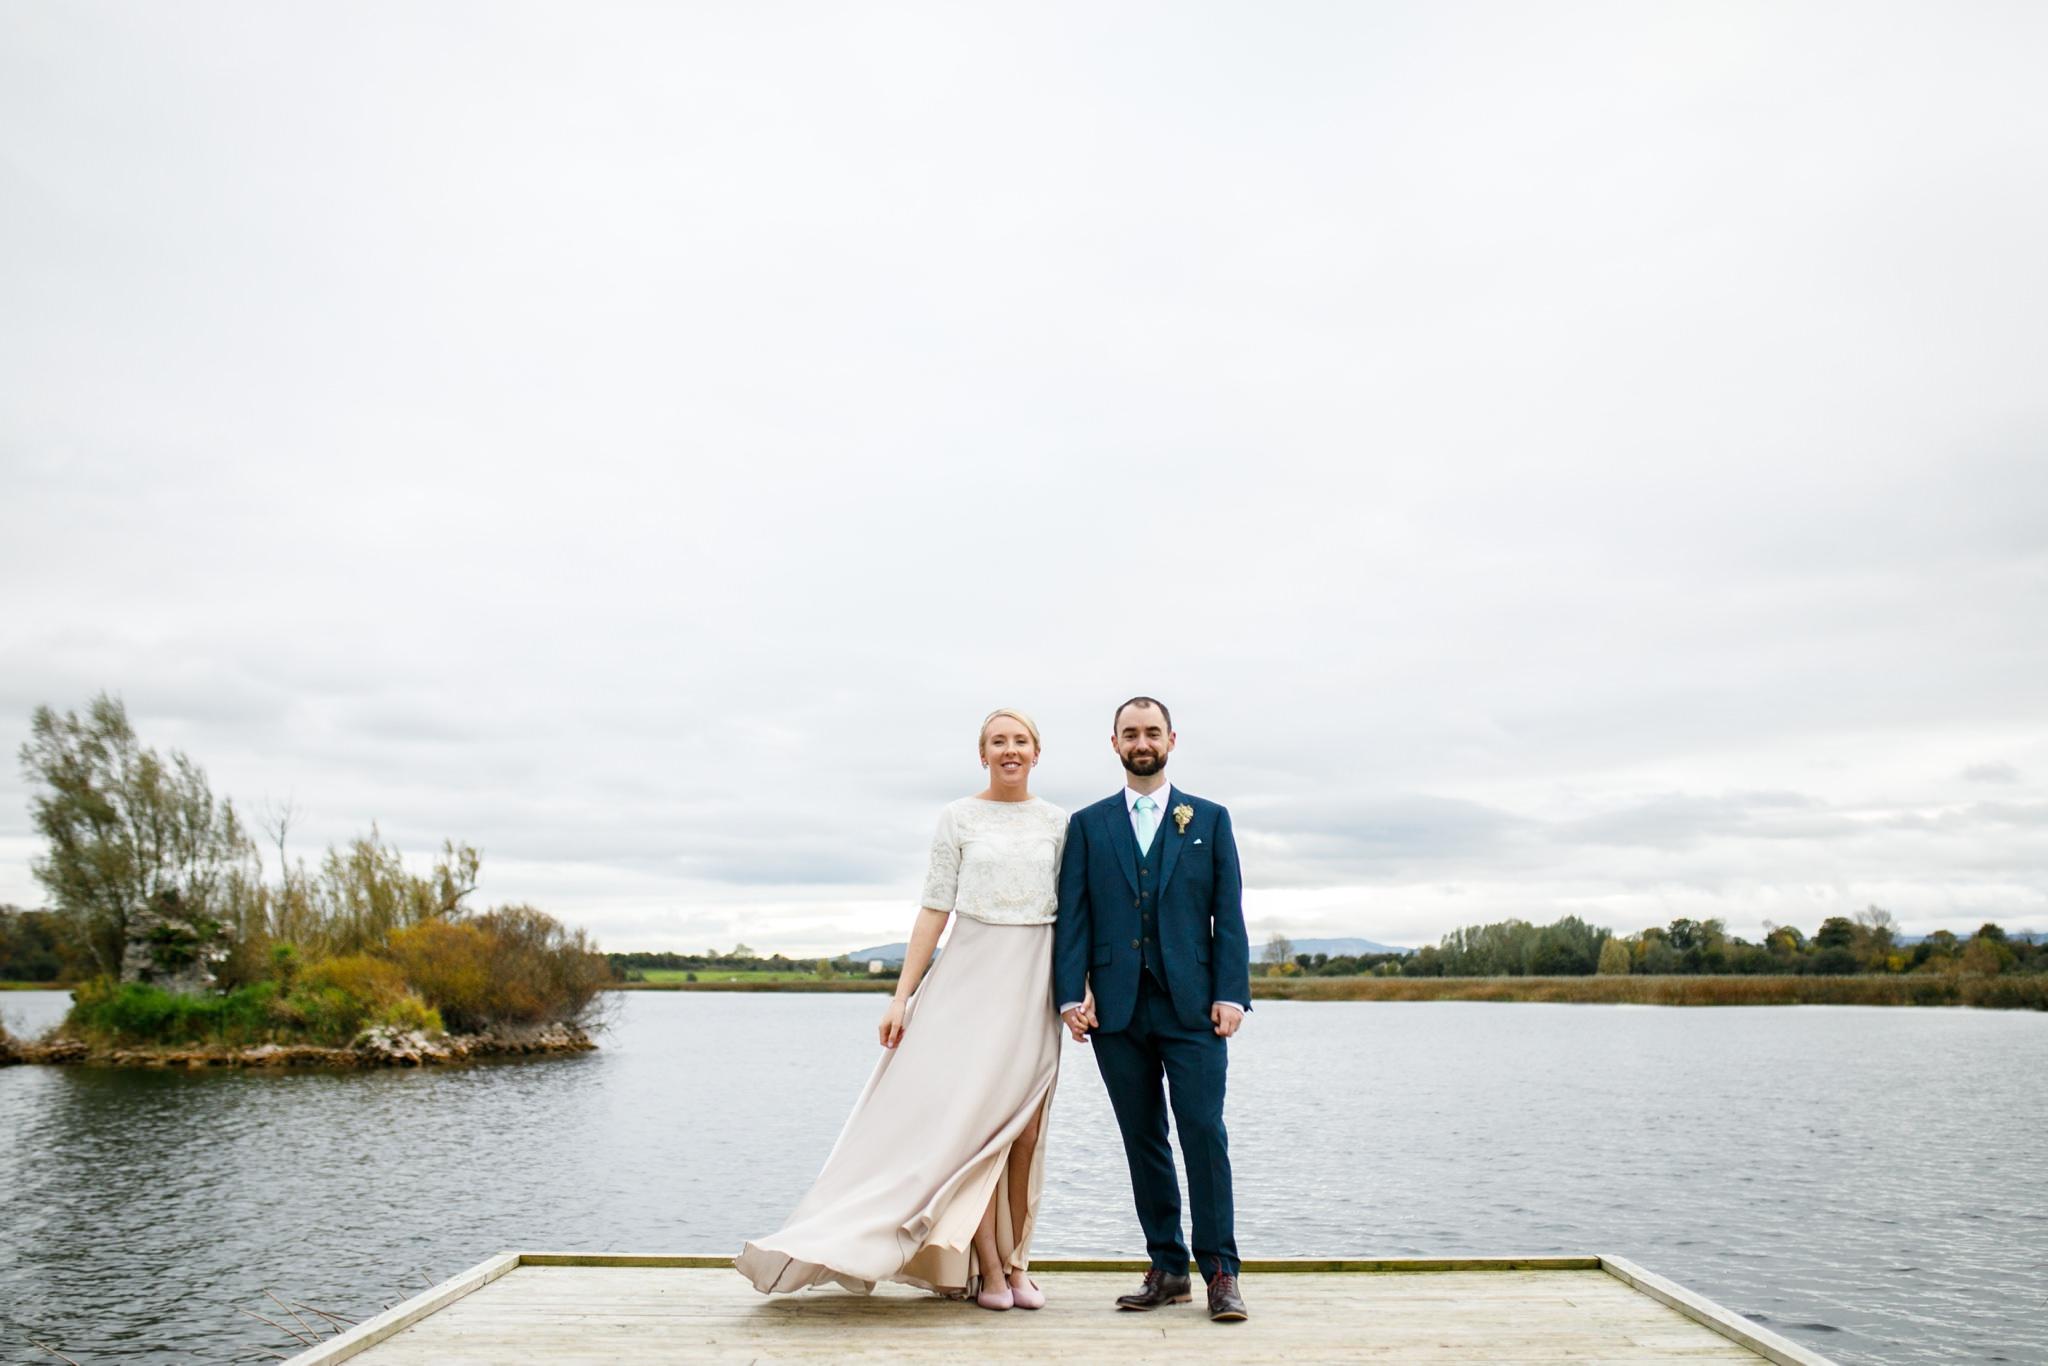 Elisha-Clarke-Photography-Dublin-City-Wedding_0087.jpg